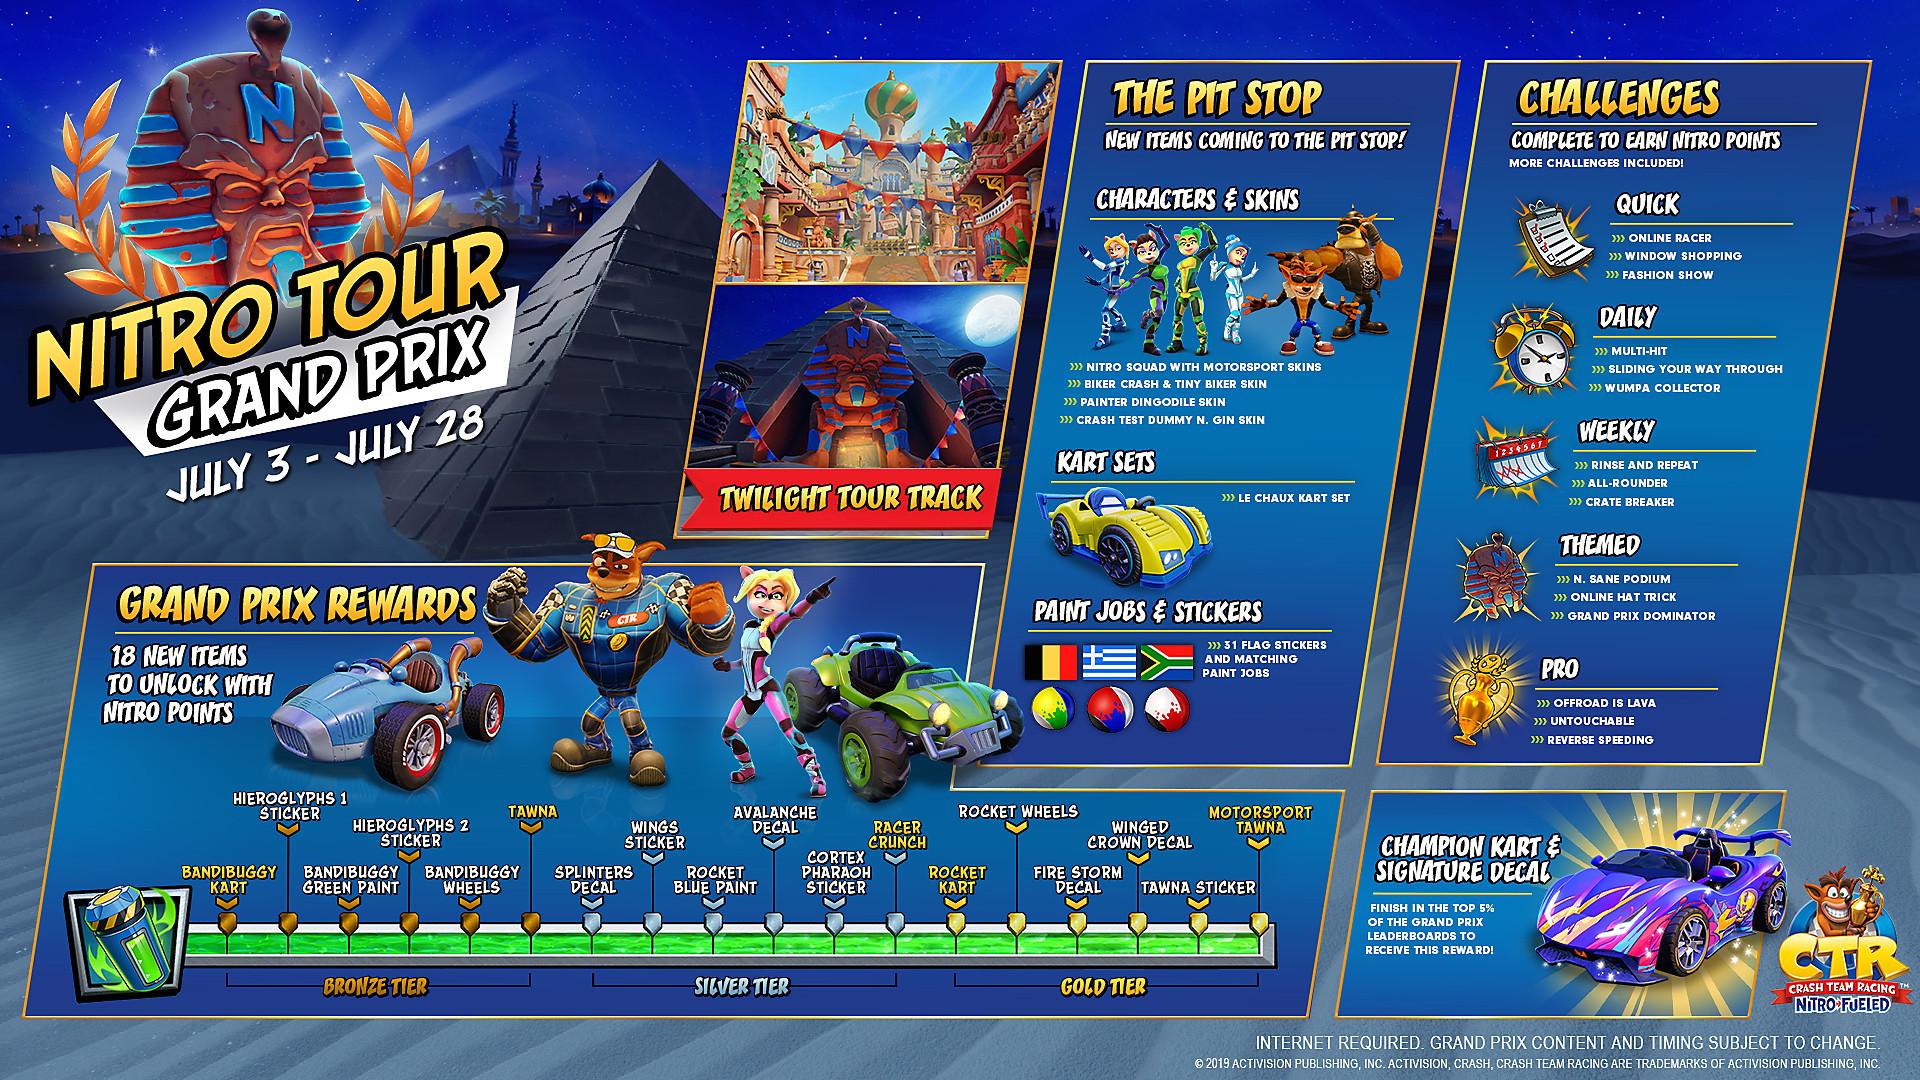 Crash™ Team Racing Nitro-Fueled | Nitro Tour Grand Prix Game